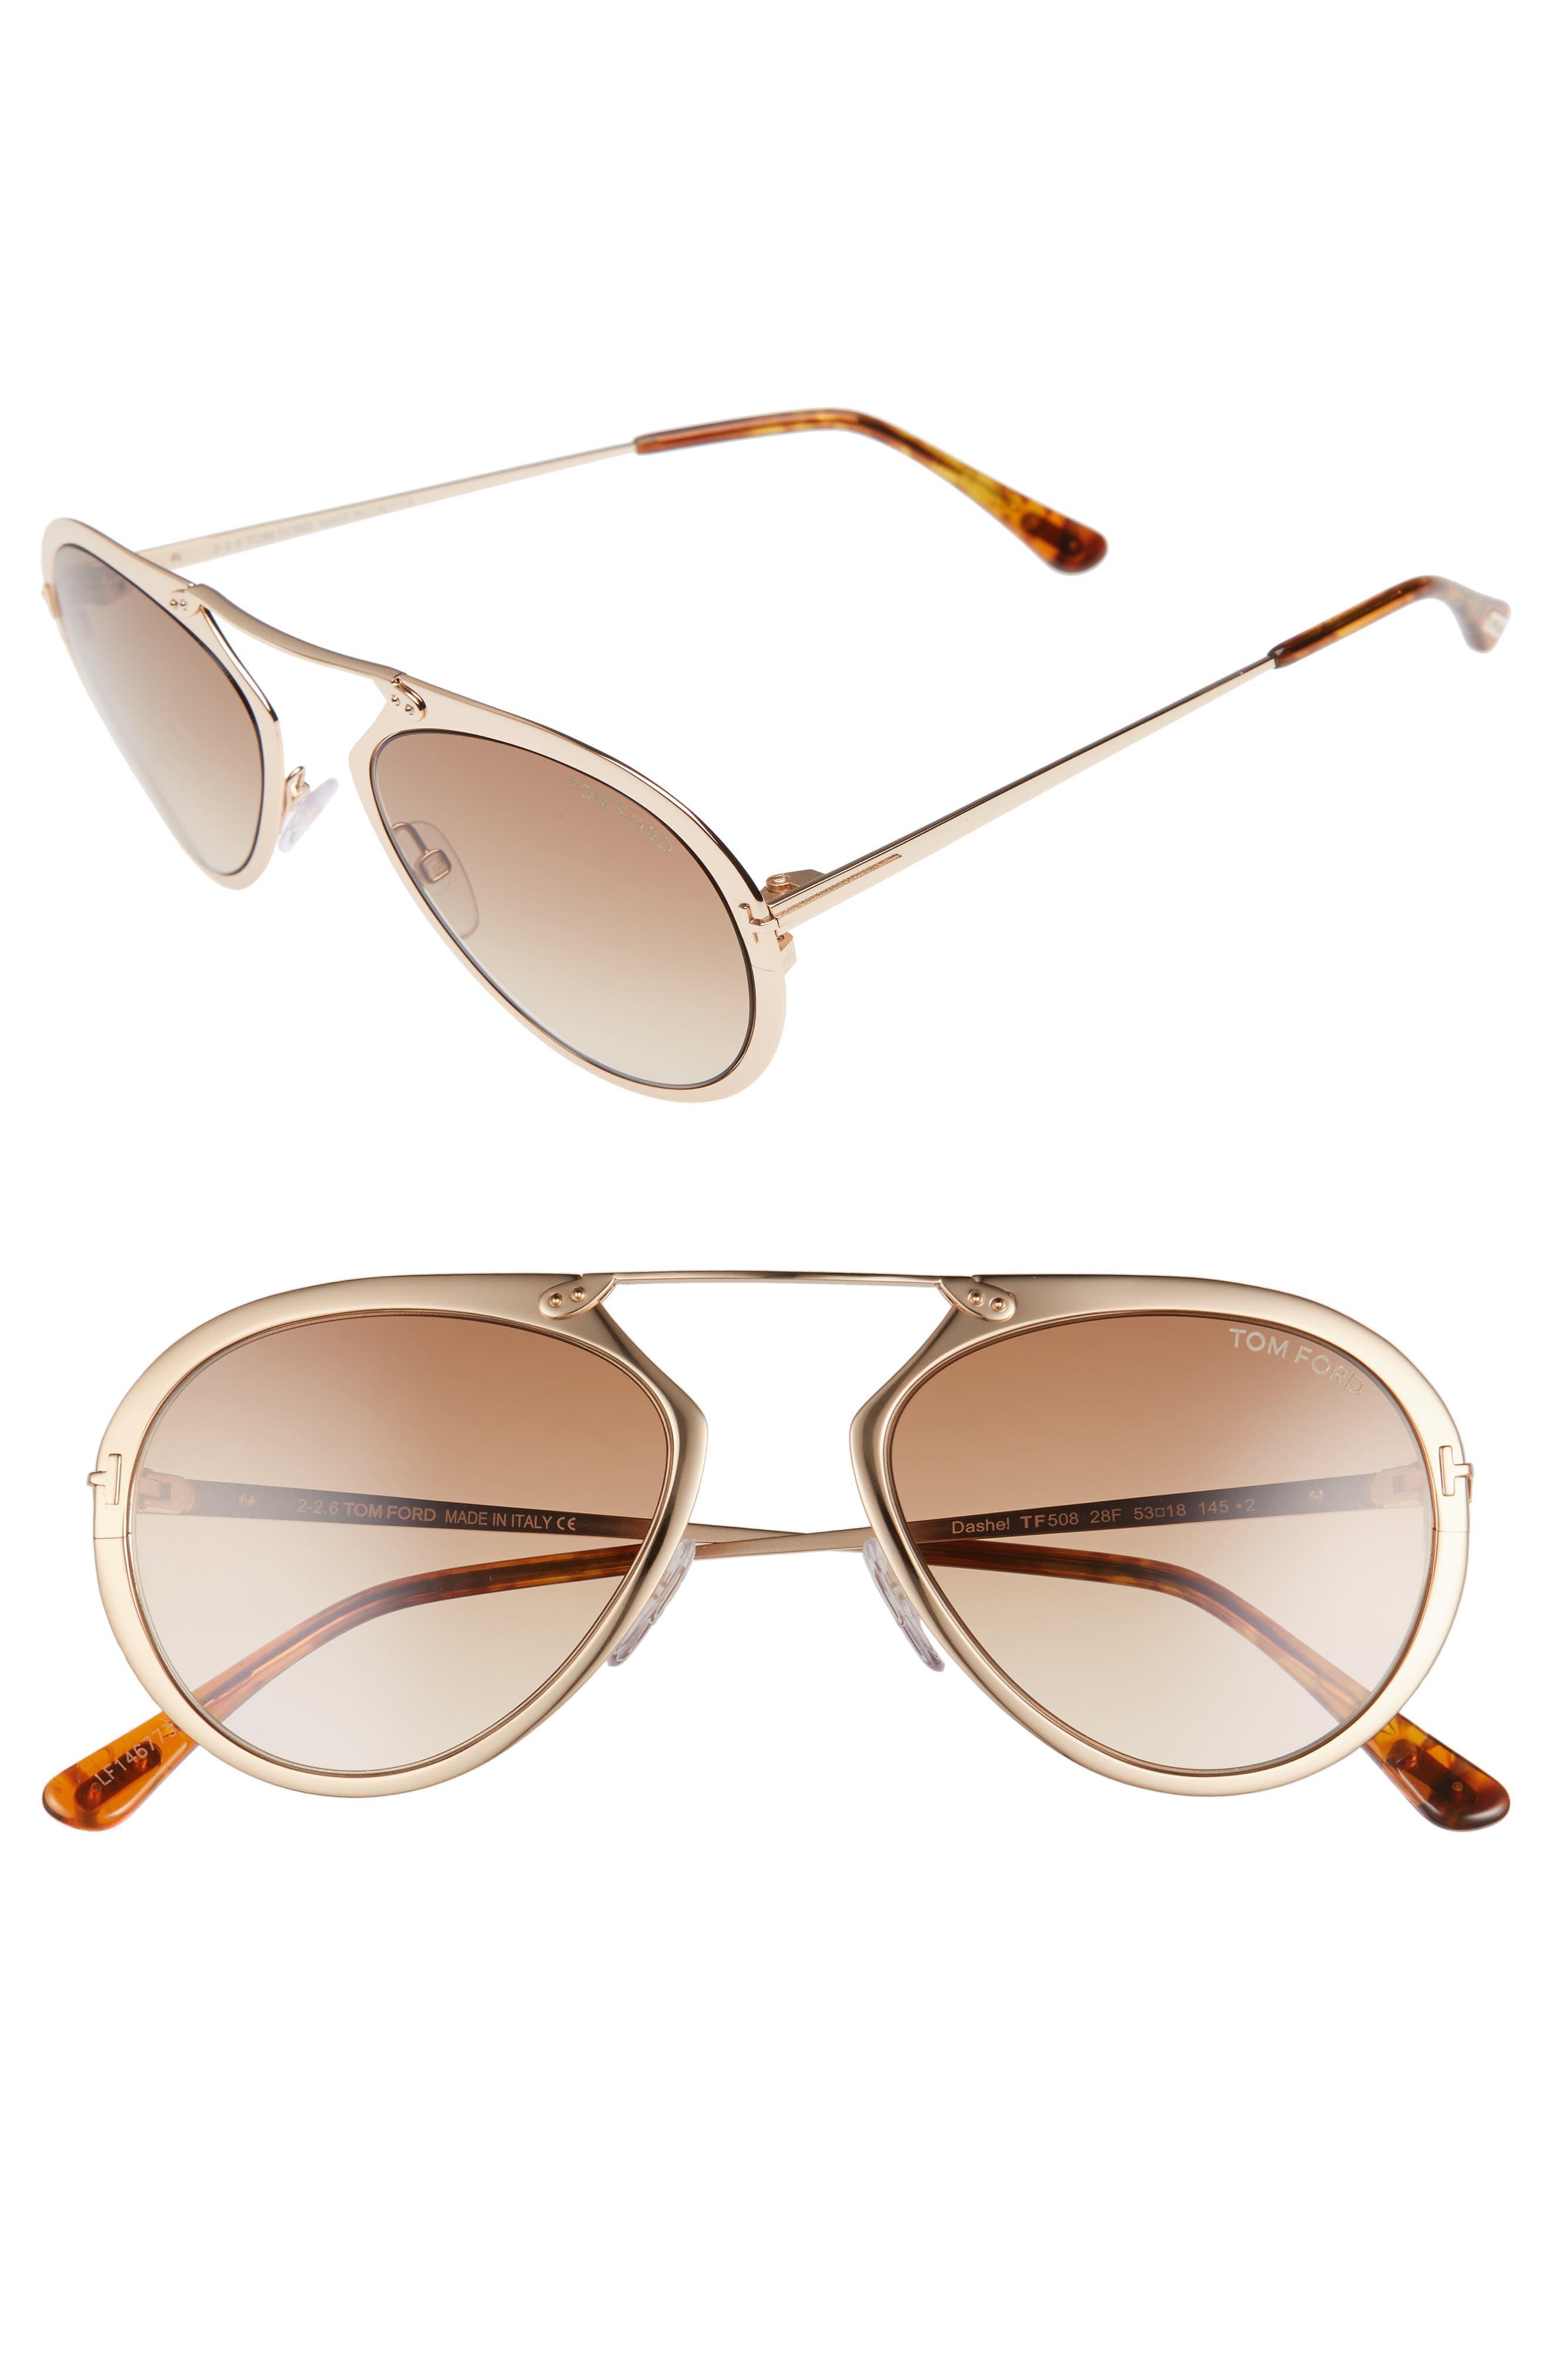 Main Image - Tom Ford Dashel 58mm Aviator Sunglasses